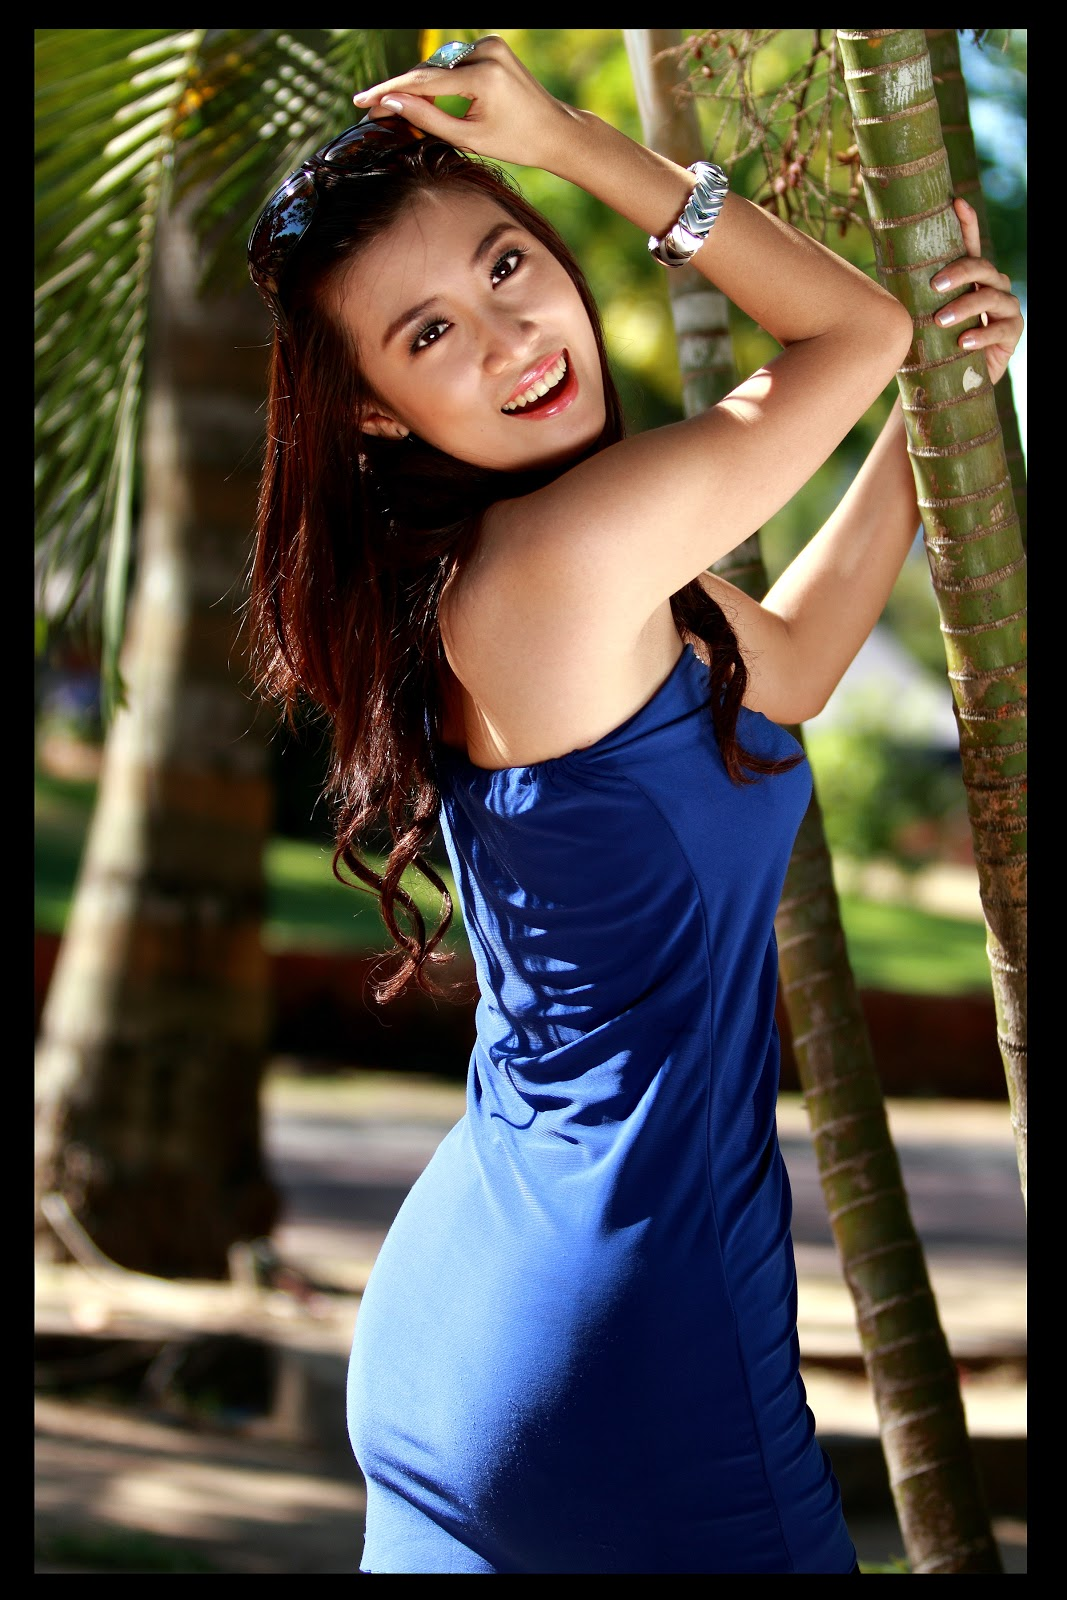 Myanmar model girl photo free download teen